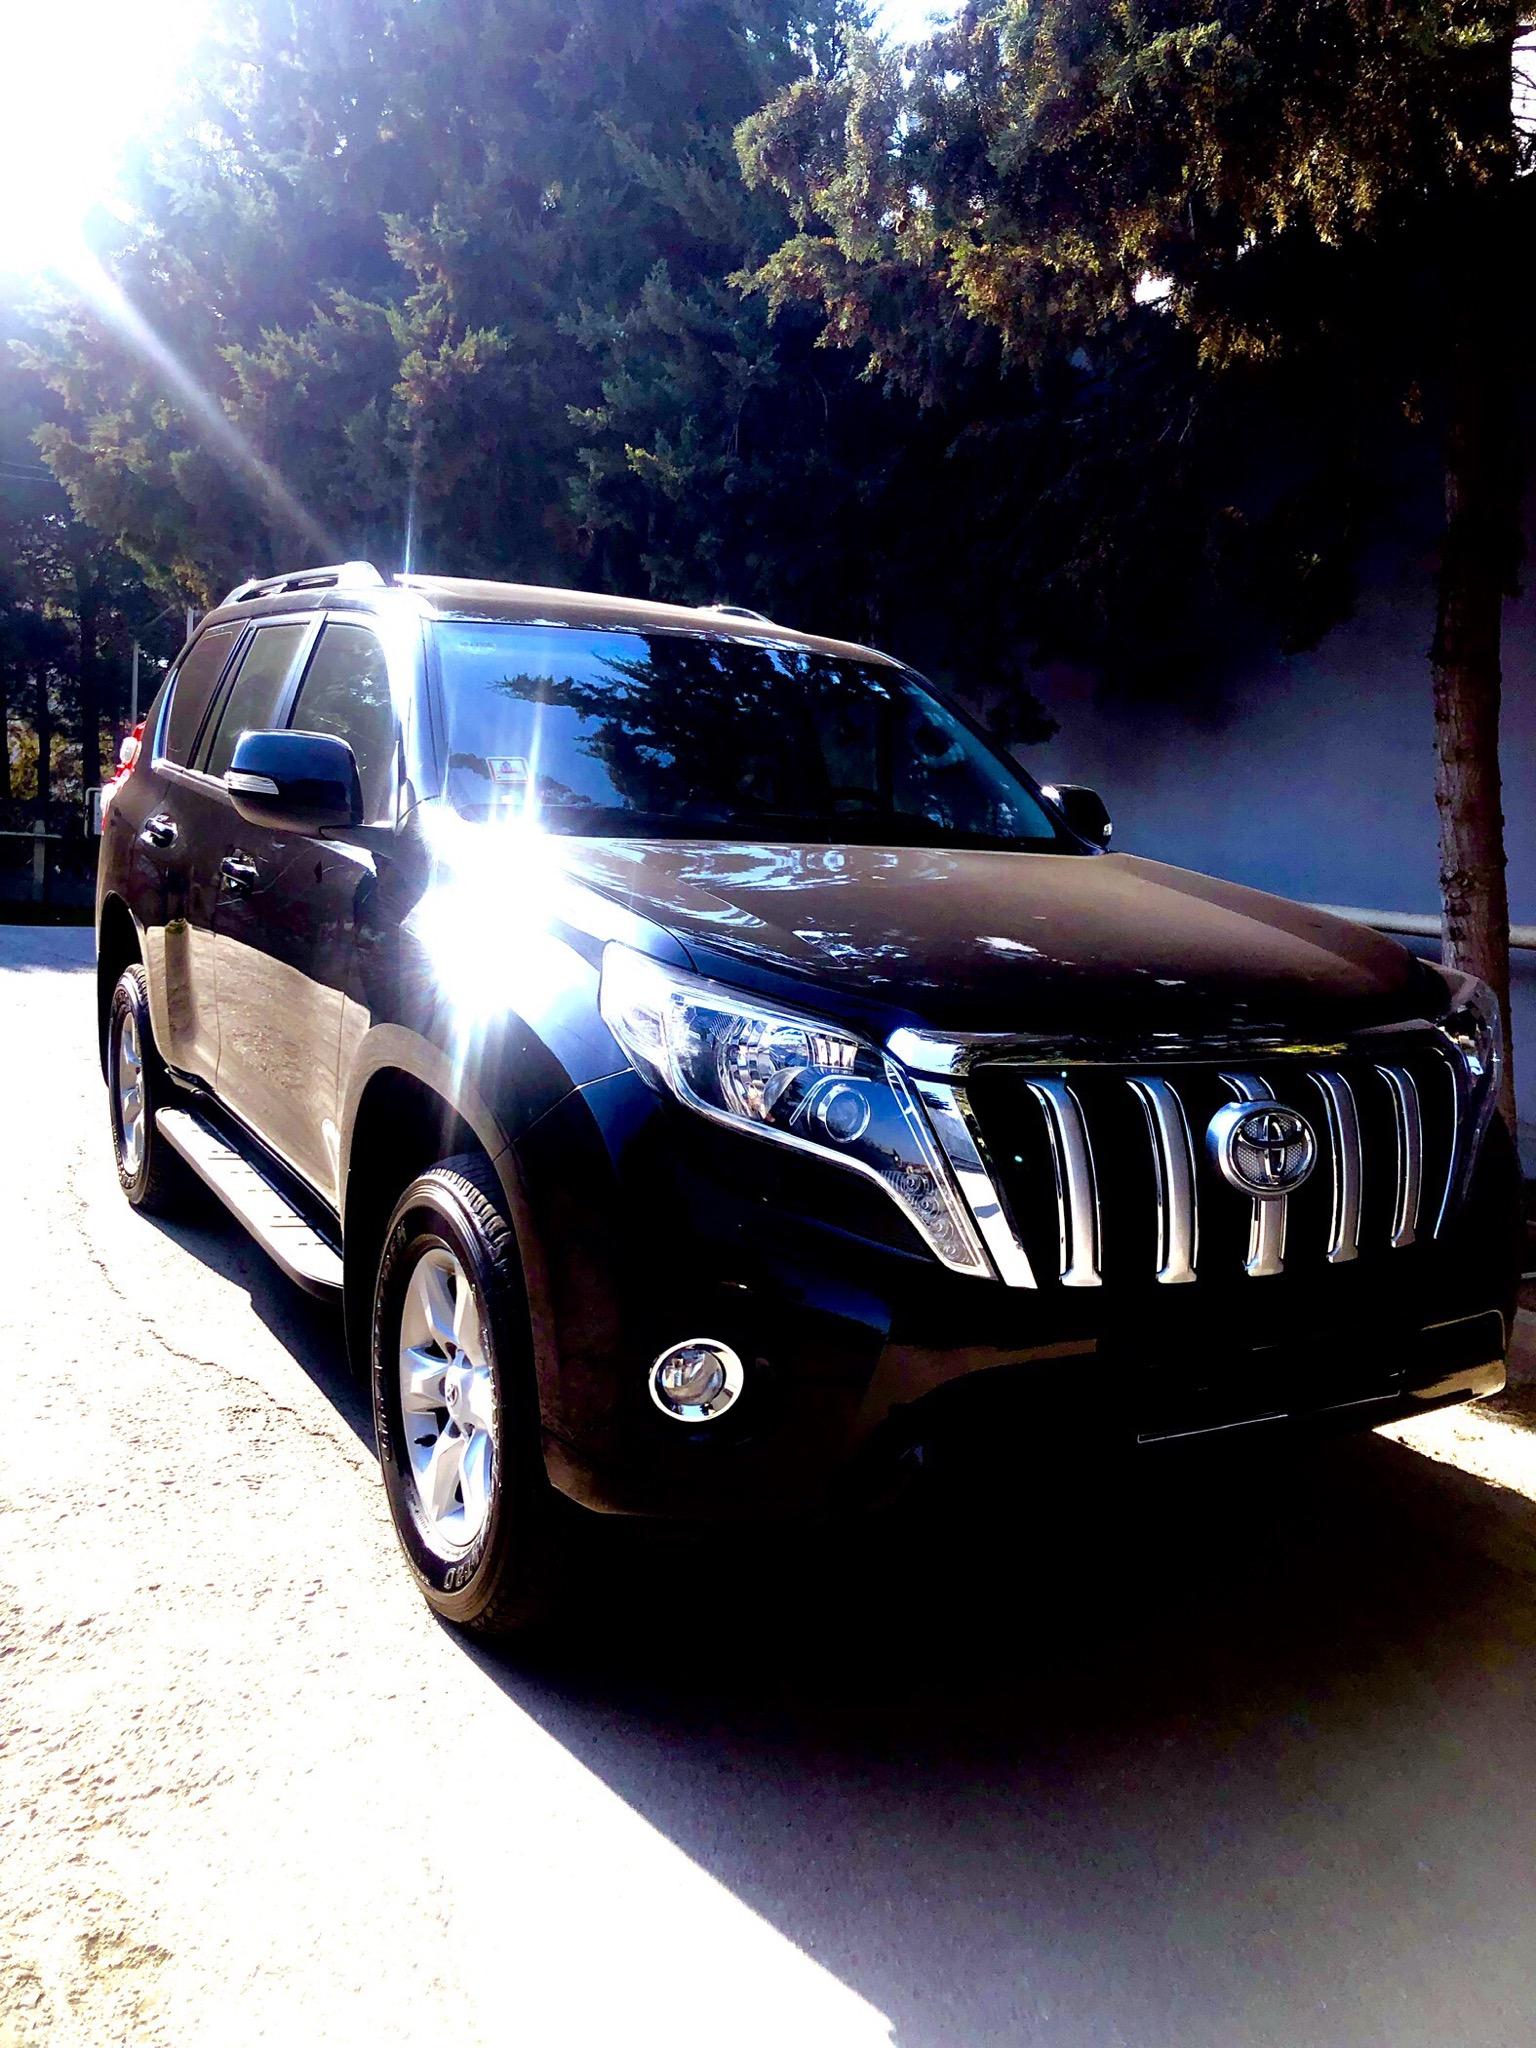 Toyota Prado 2.7(lt) 2013 İkinci əl  $35000